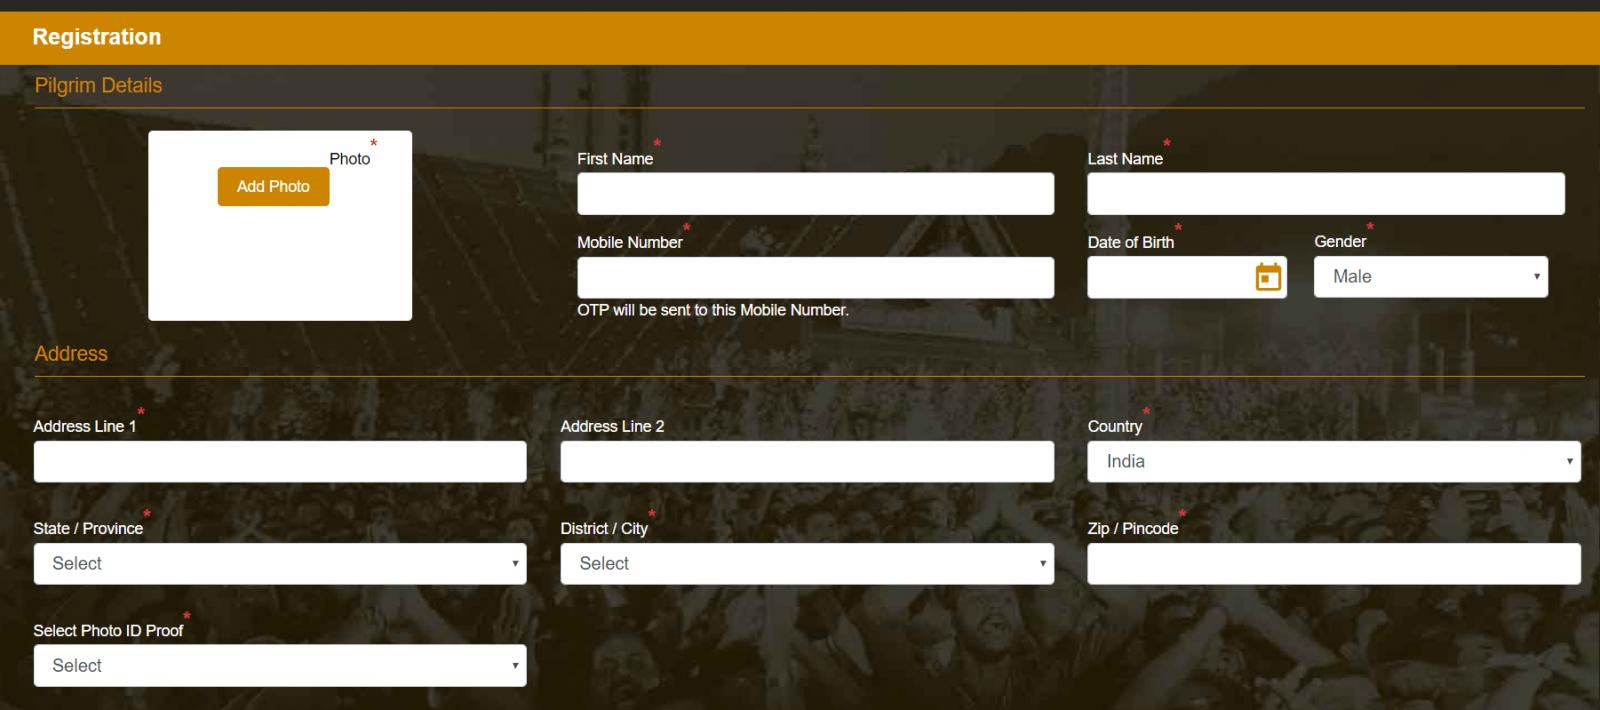 sabarimala-online-services-registration